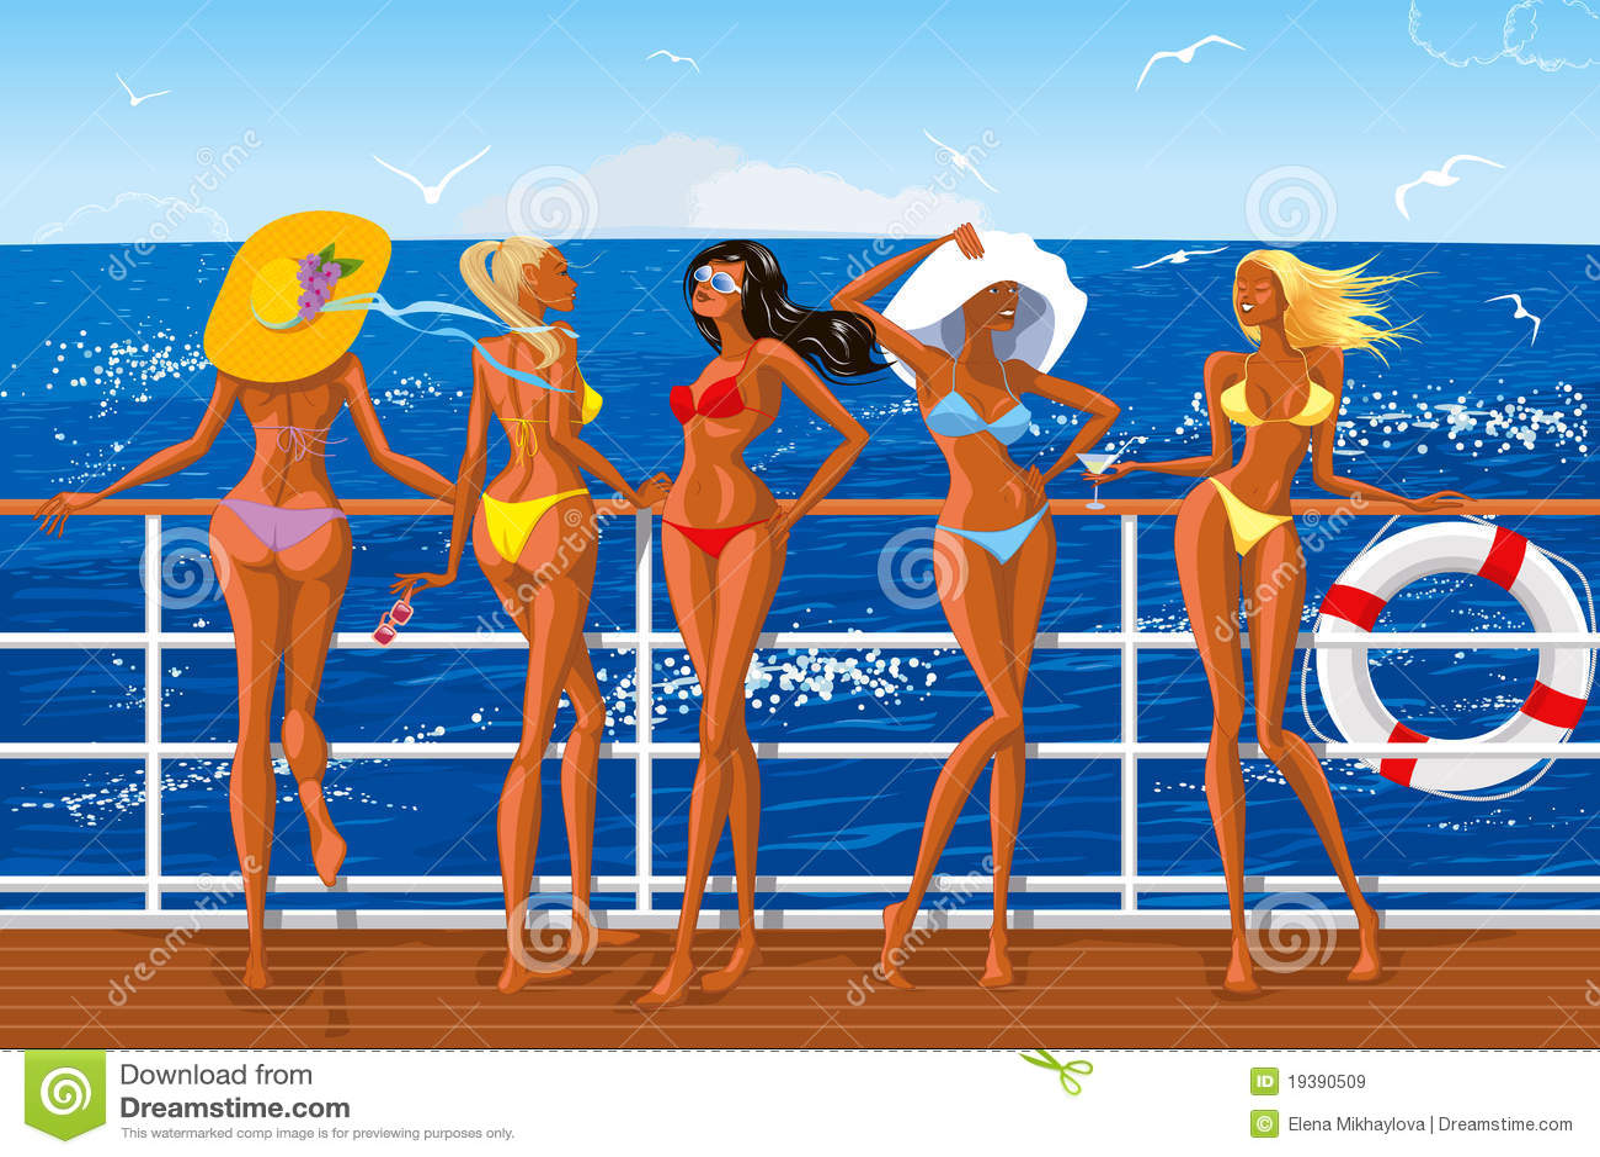 Free clips of bikini girls — img 15